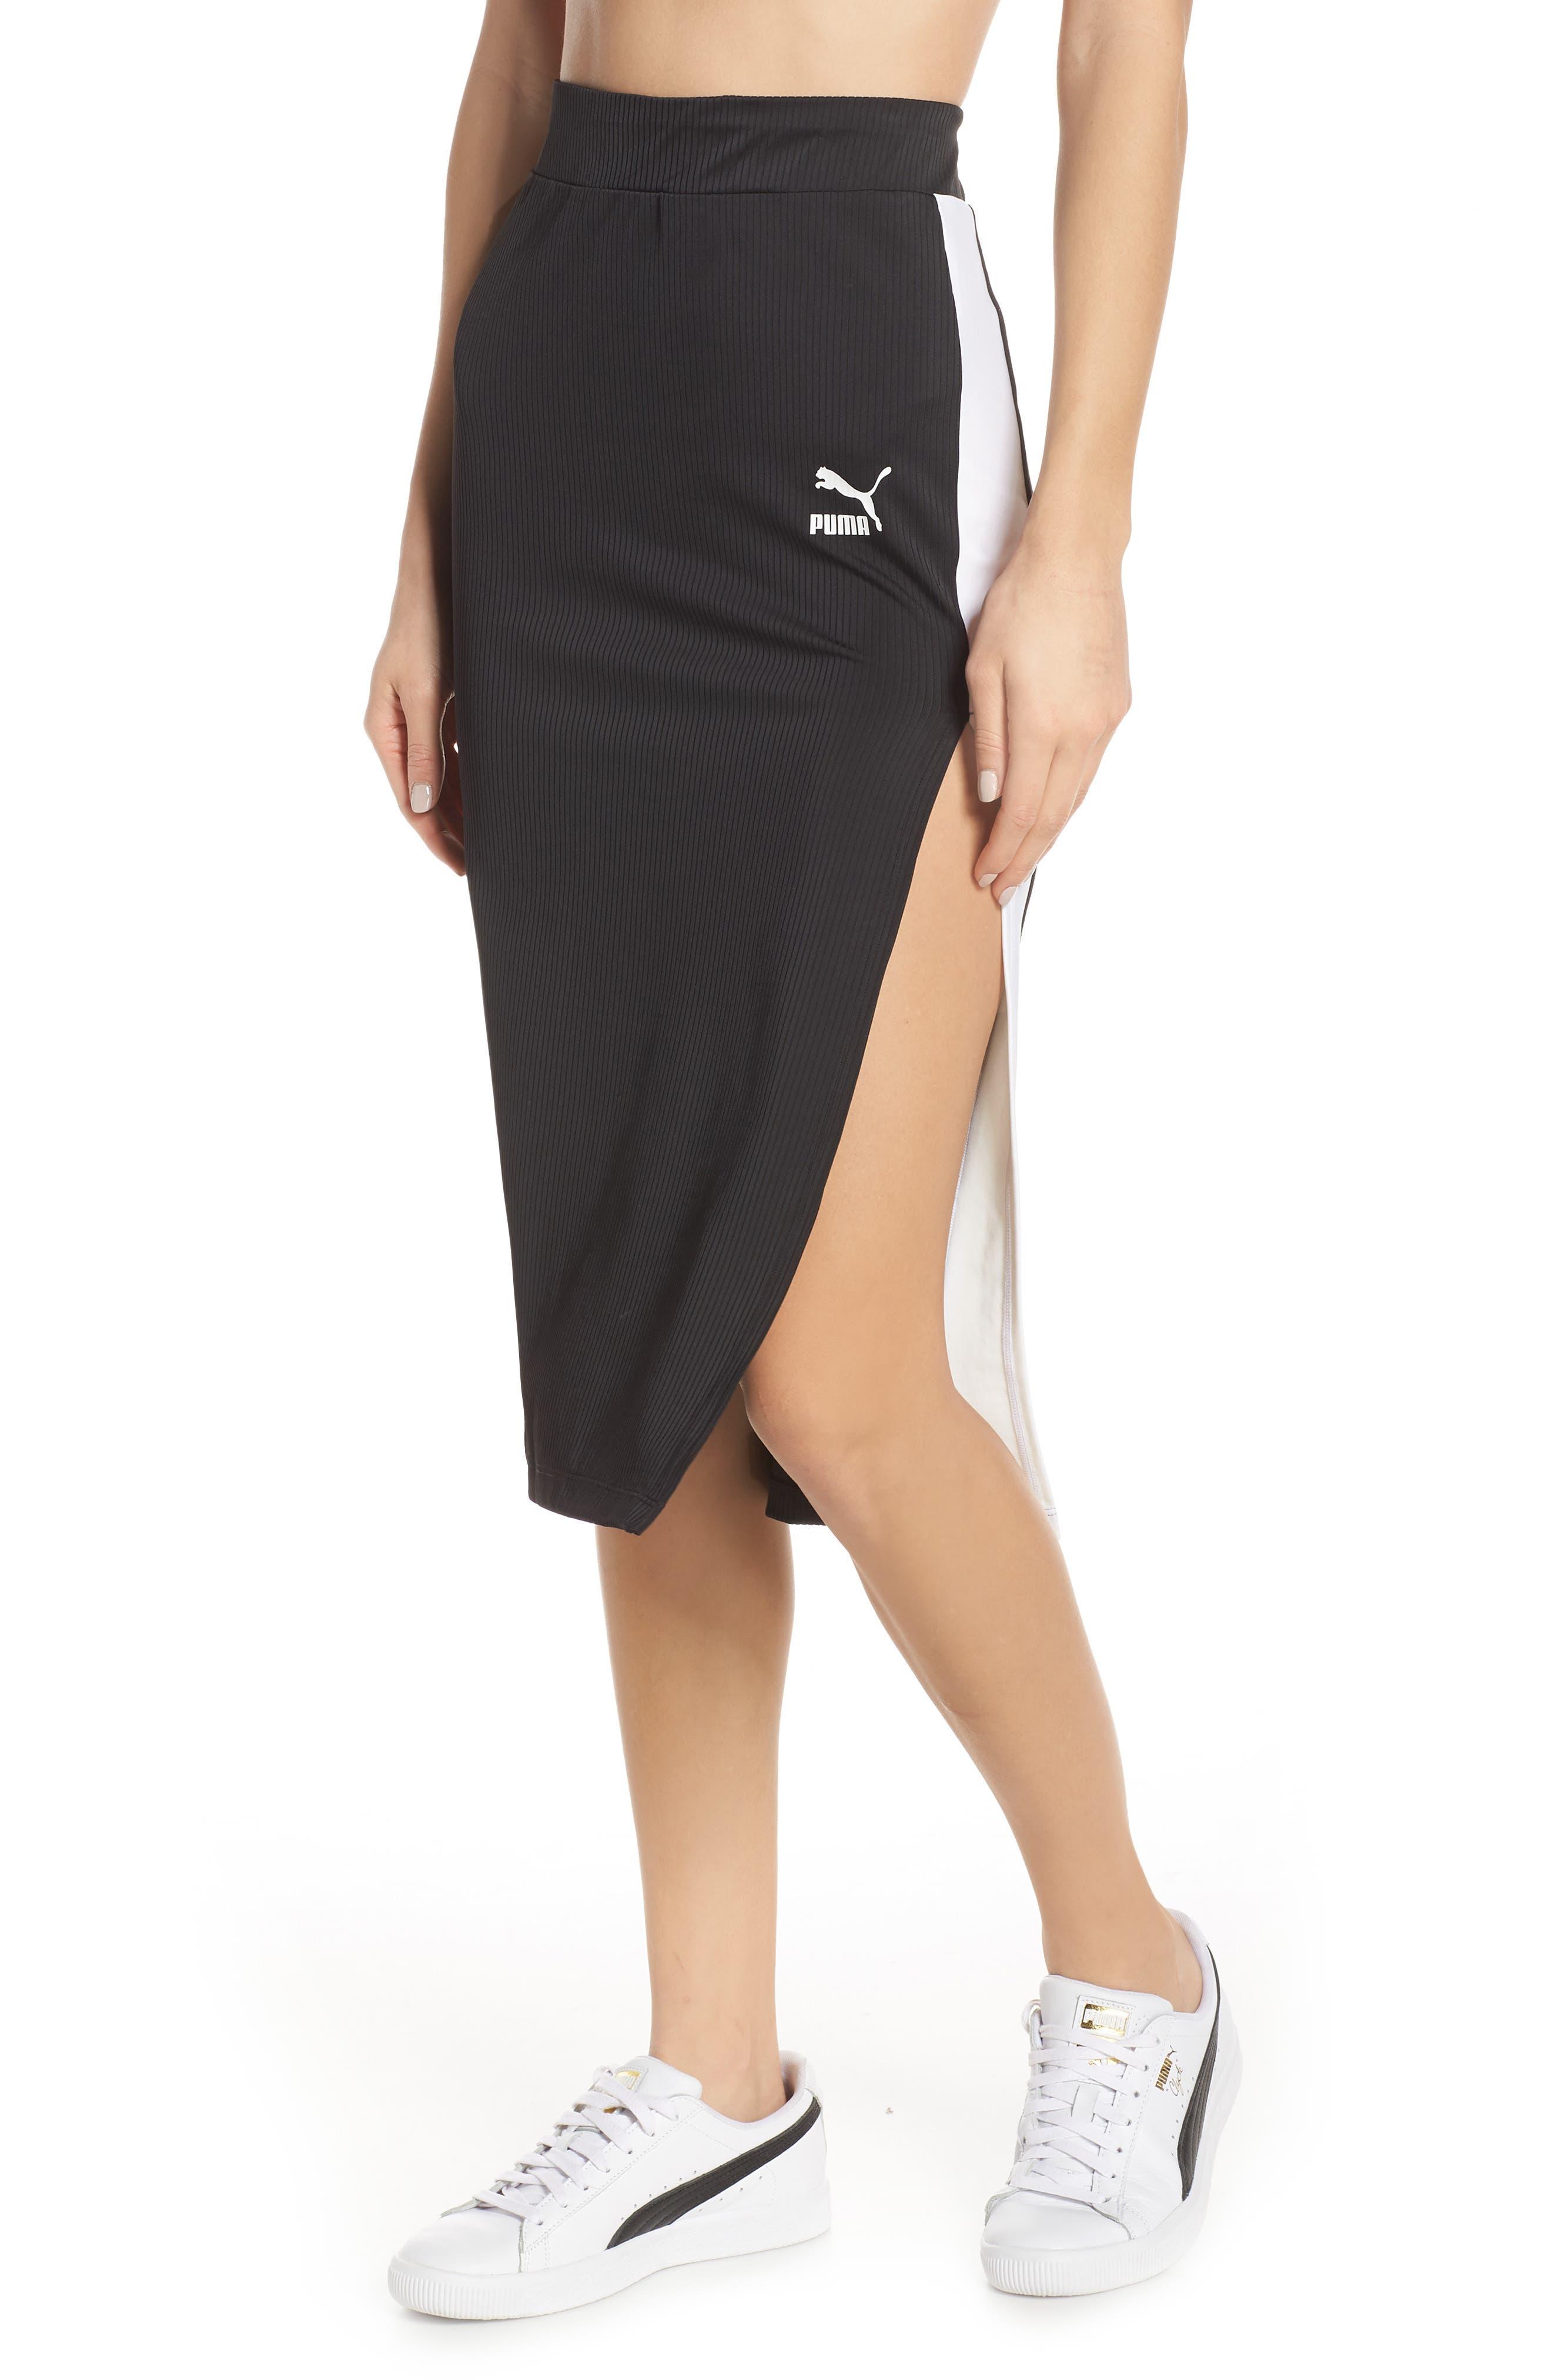 PUMA, Classics Ribbed Skirt, Main thumbnail 1, color, 001